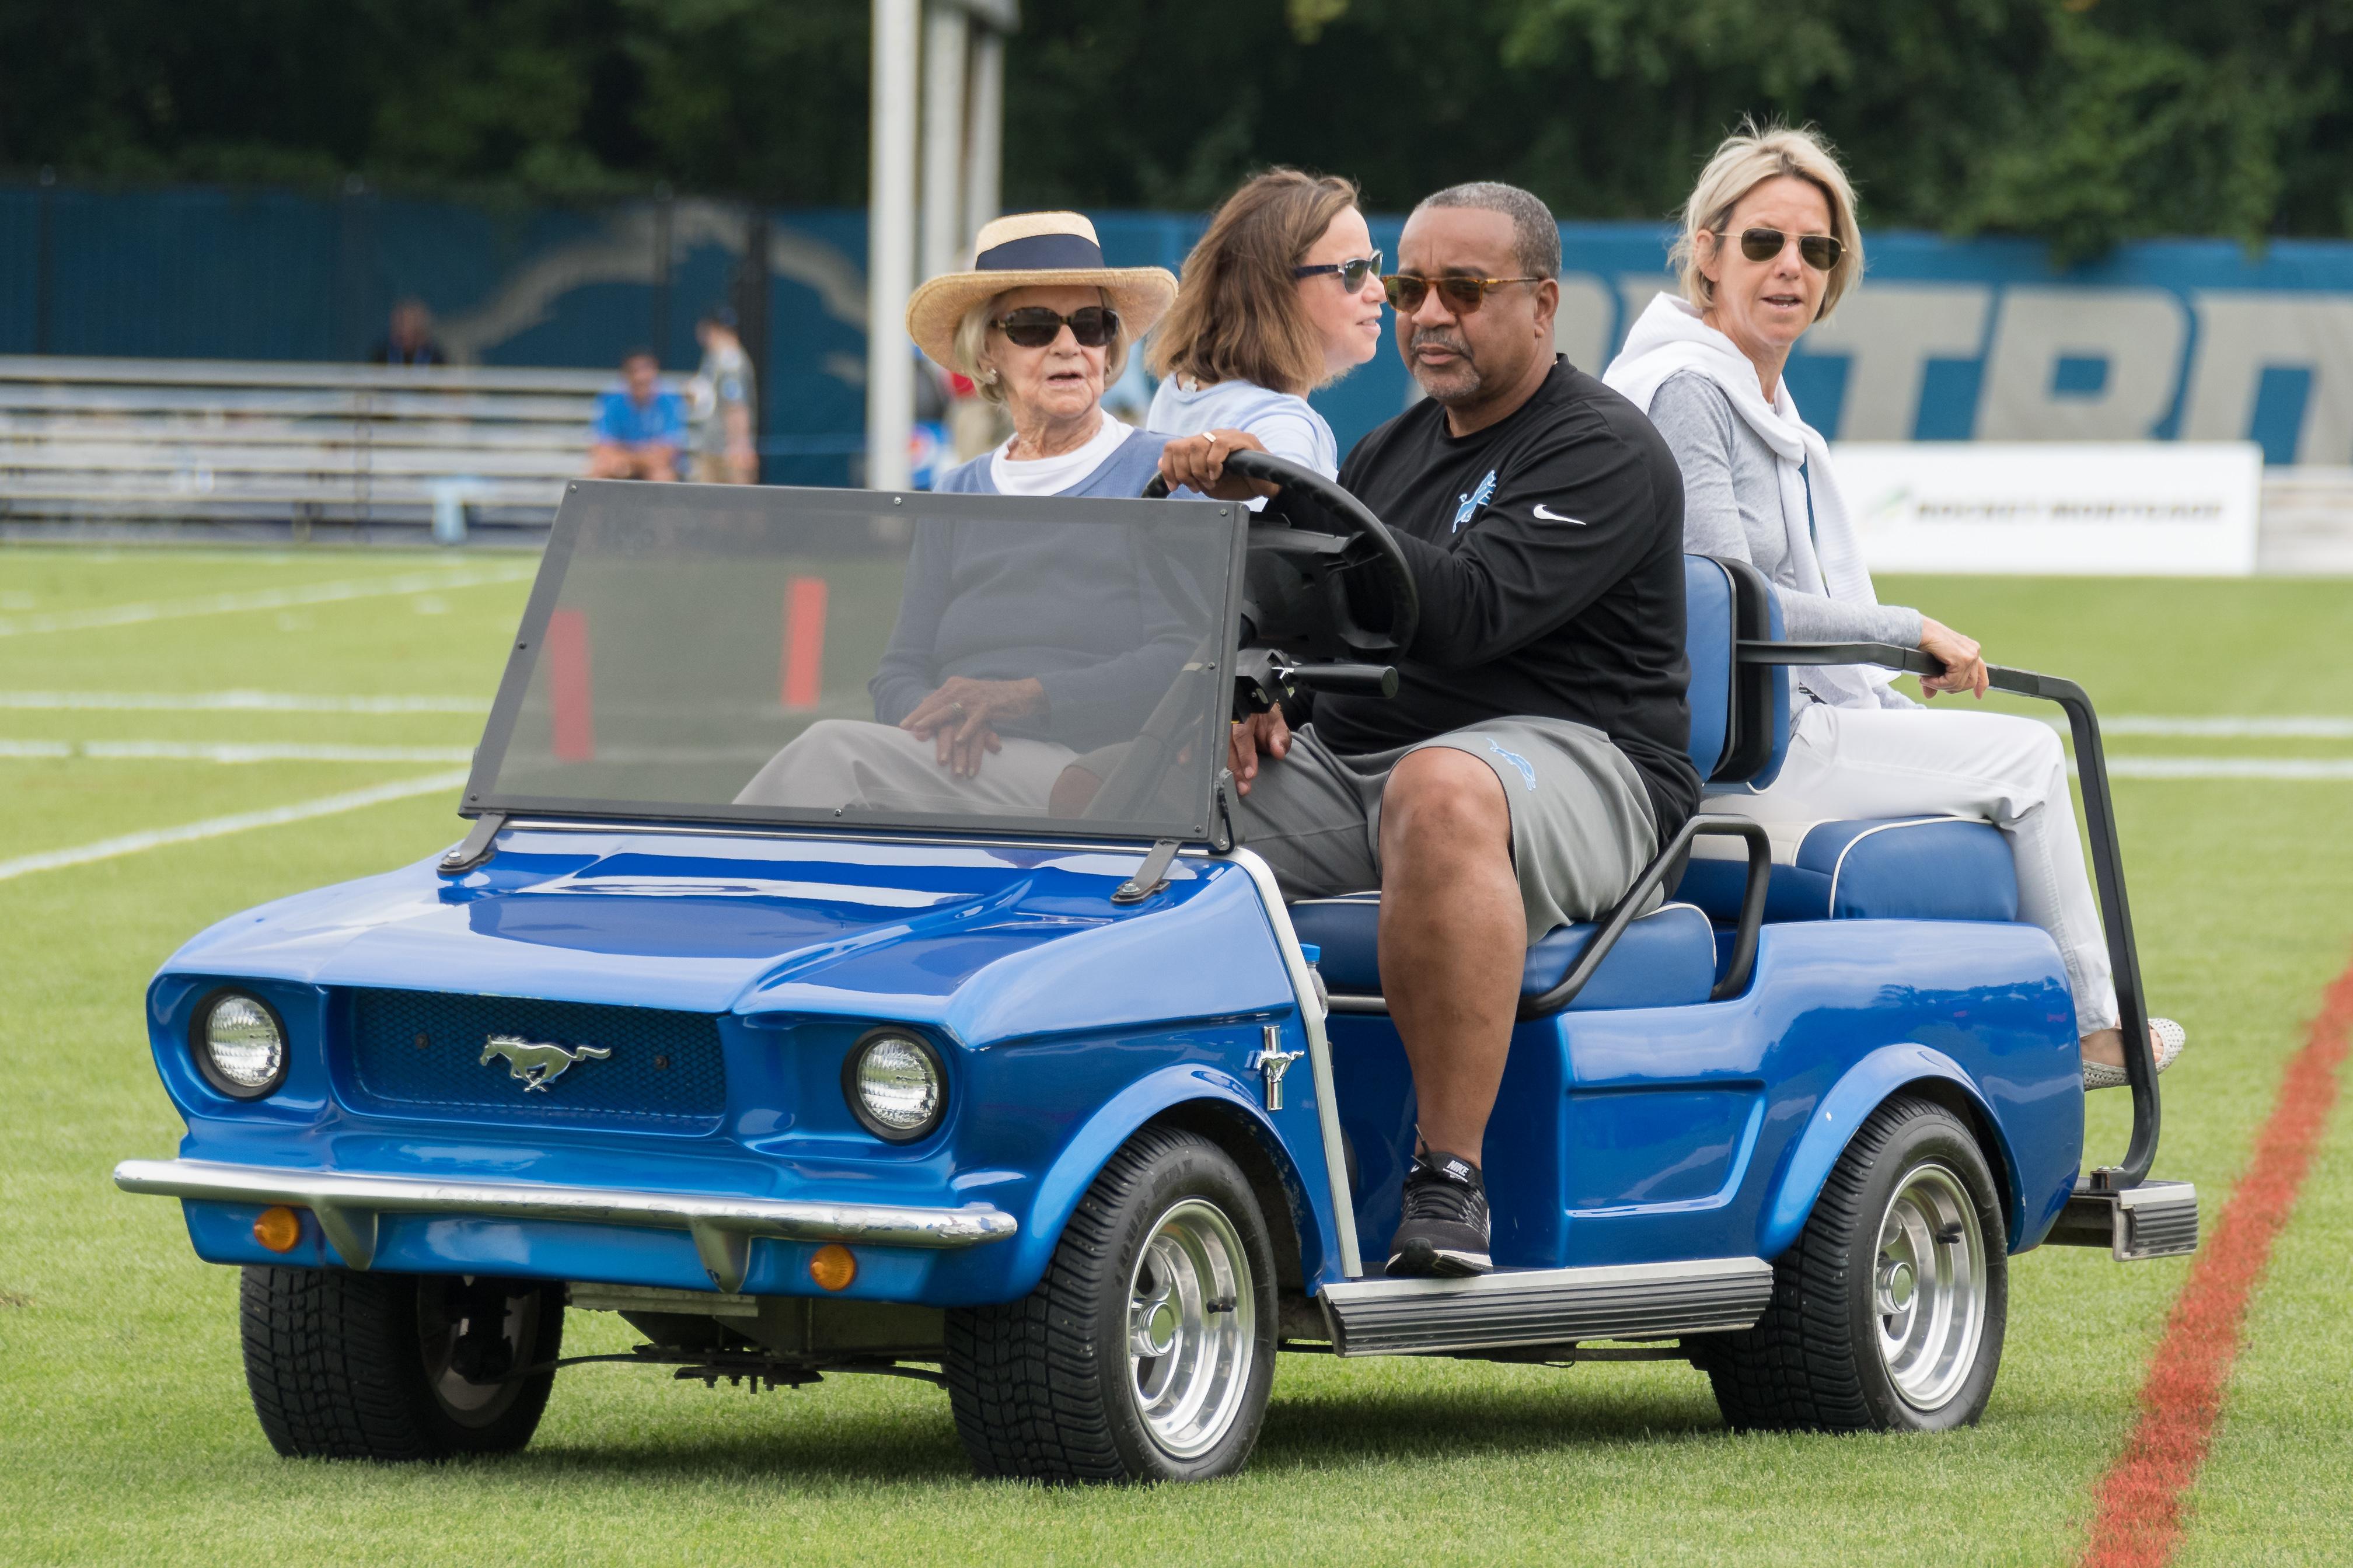 NFL: AUG 01 Lions Training Camp